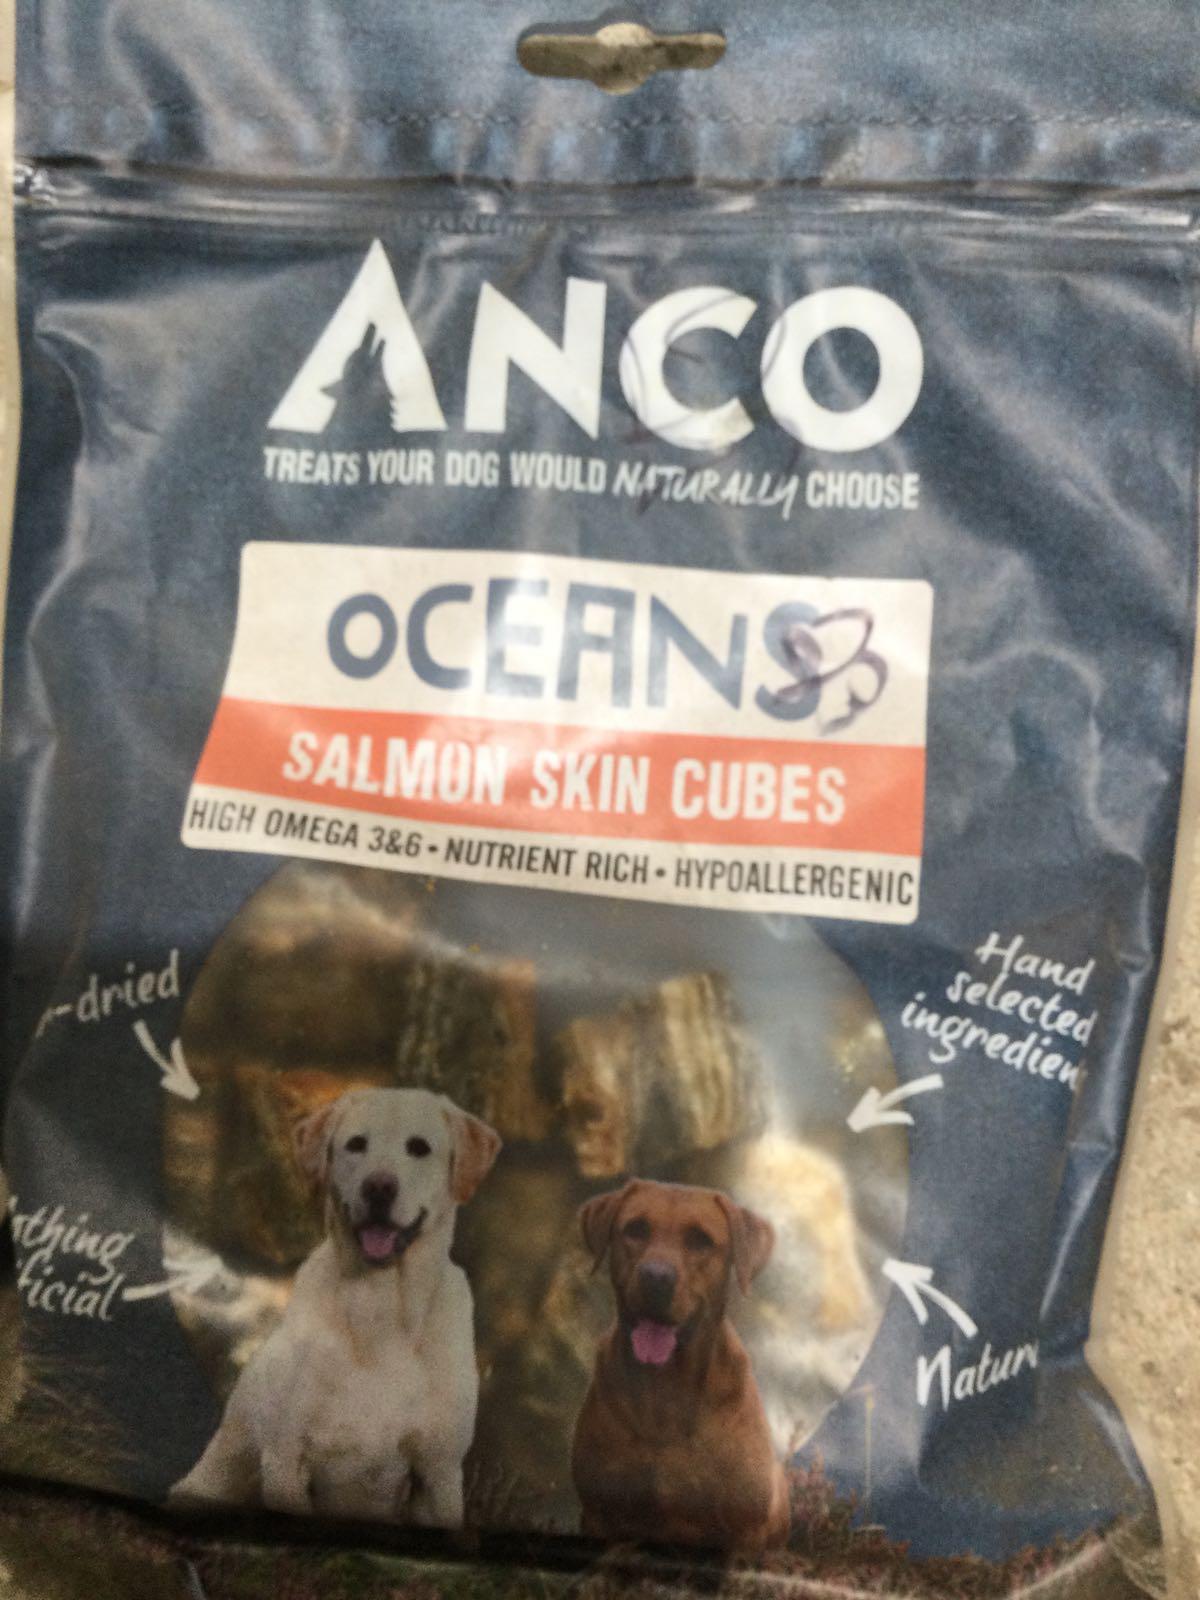 Anco Salmon skin cubes